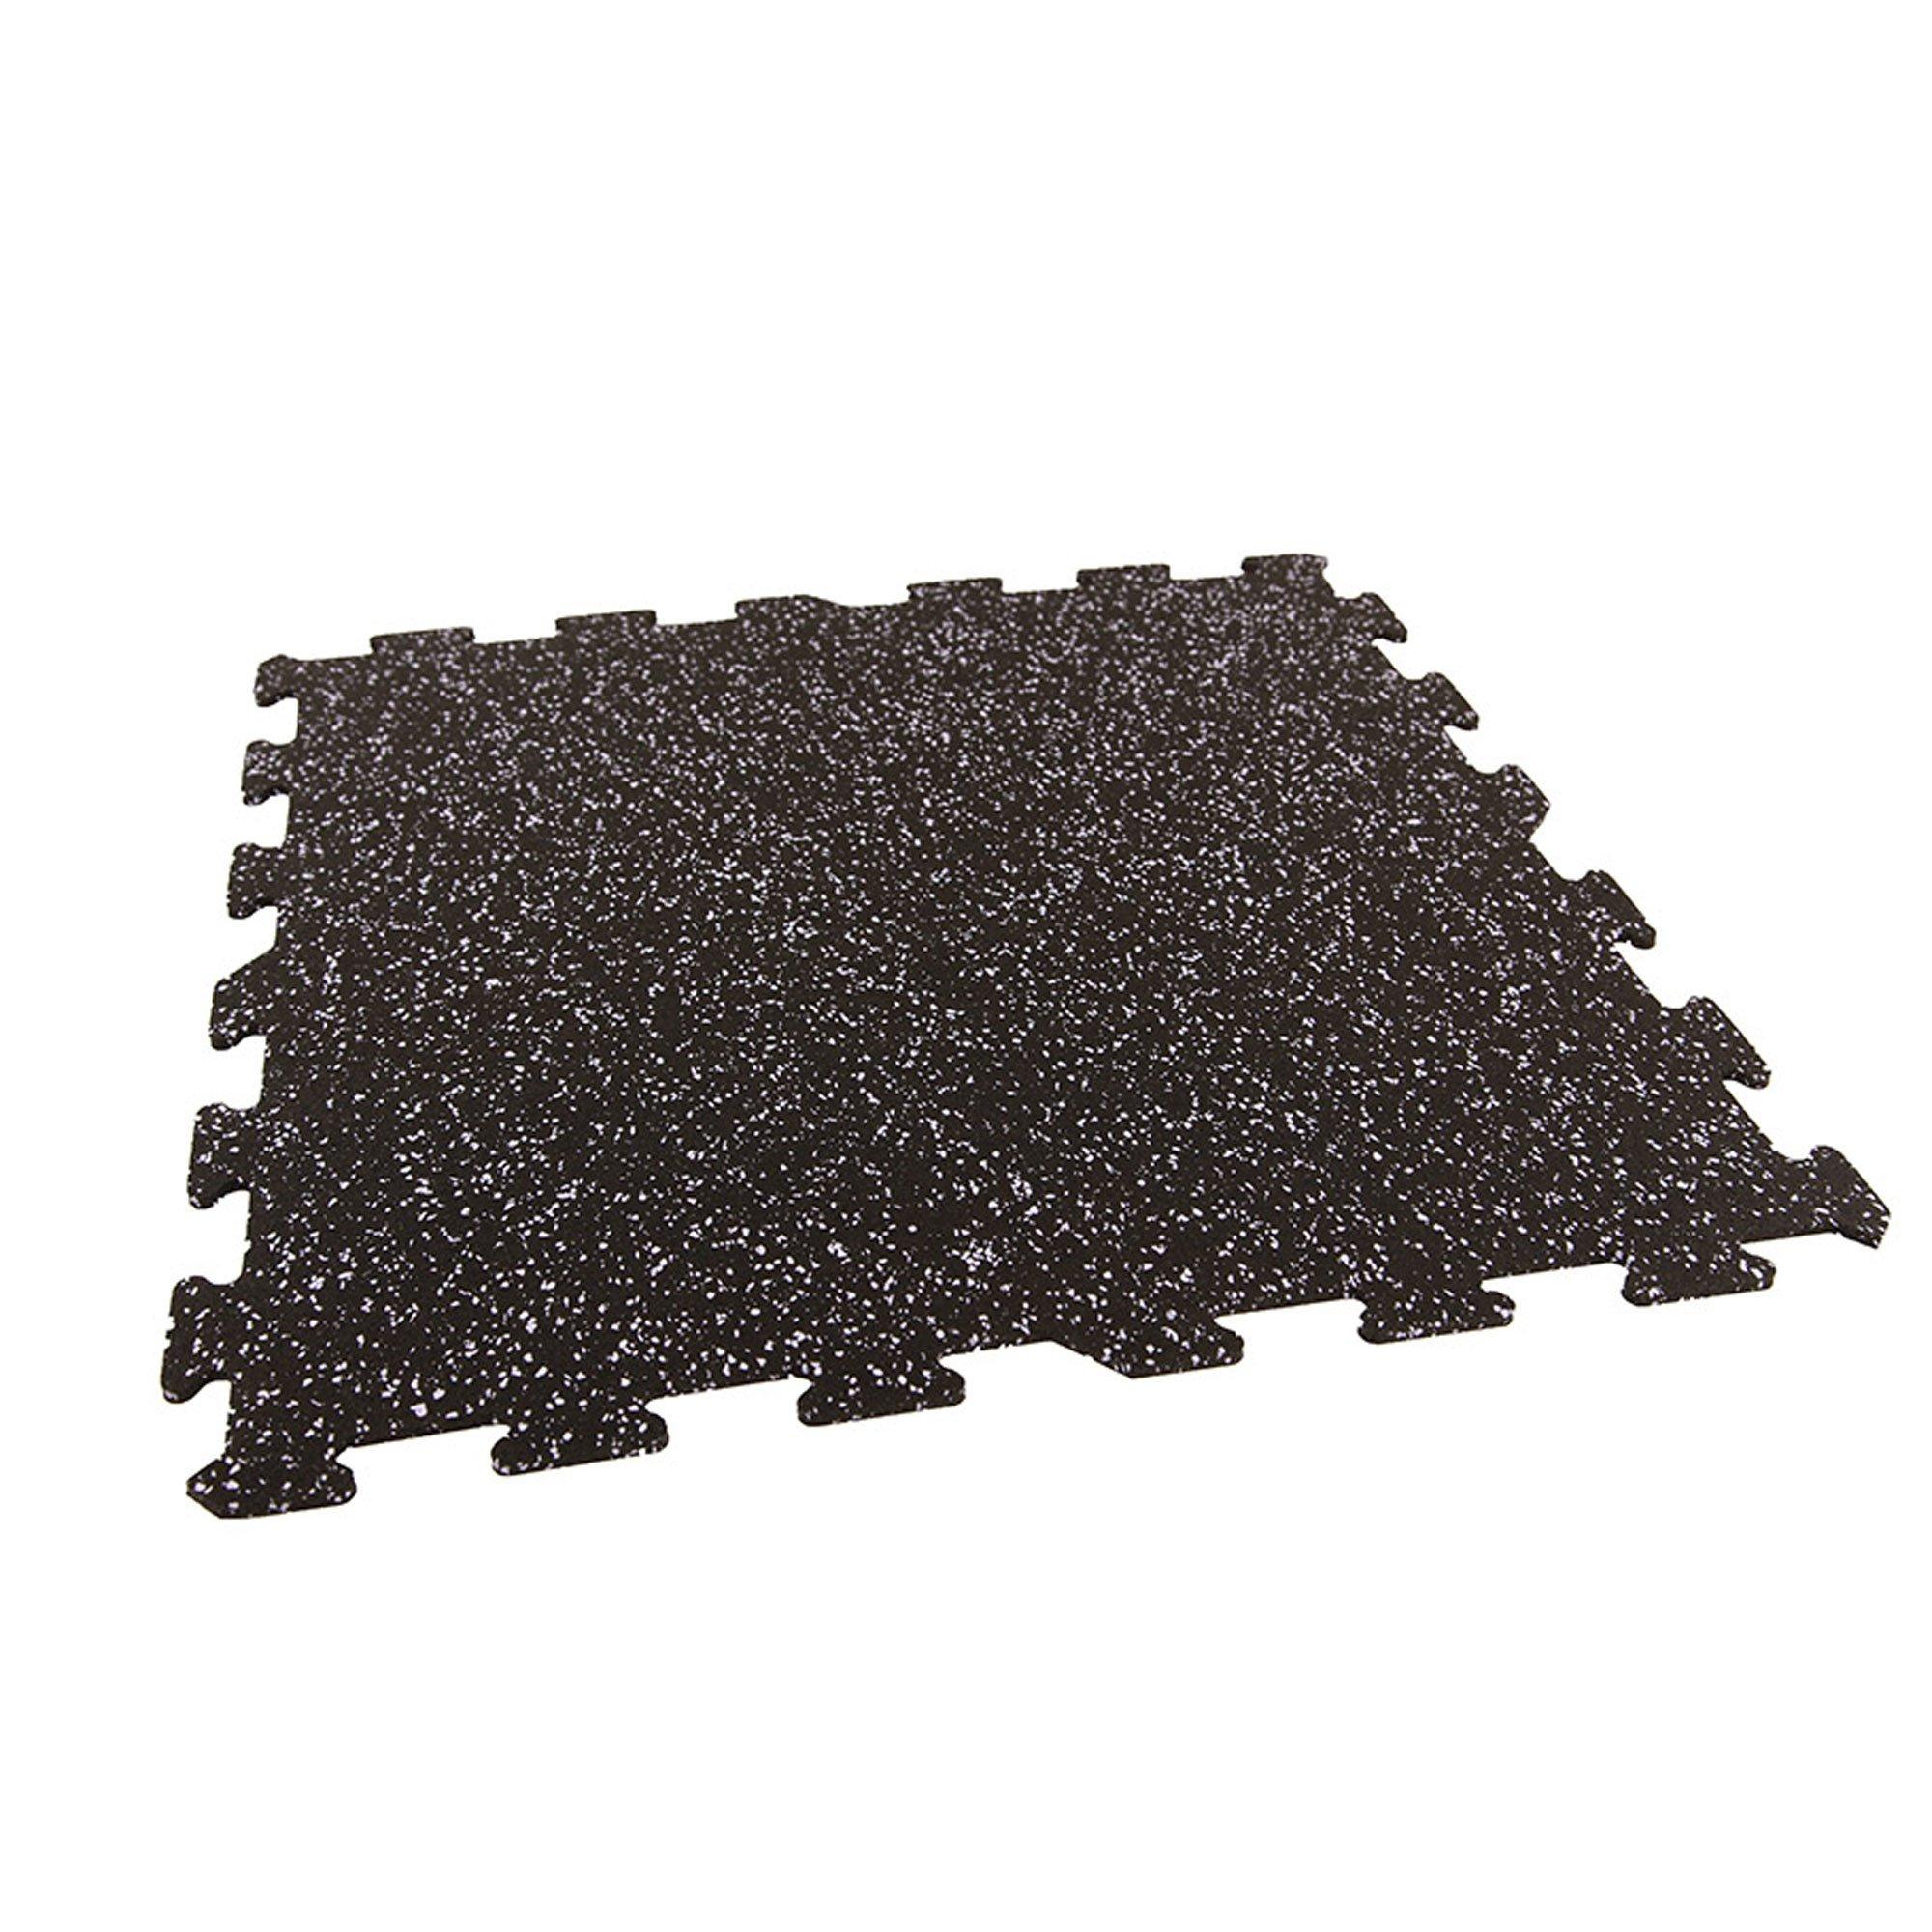 IncStores Energy Rubber Tile Flooring Equipment Mats (Confetti 25 Tiles, 100 Sqft)